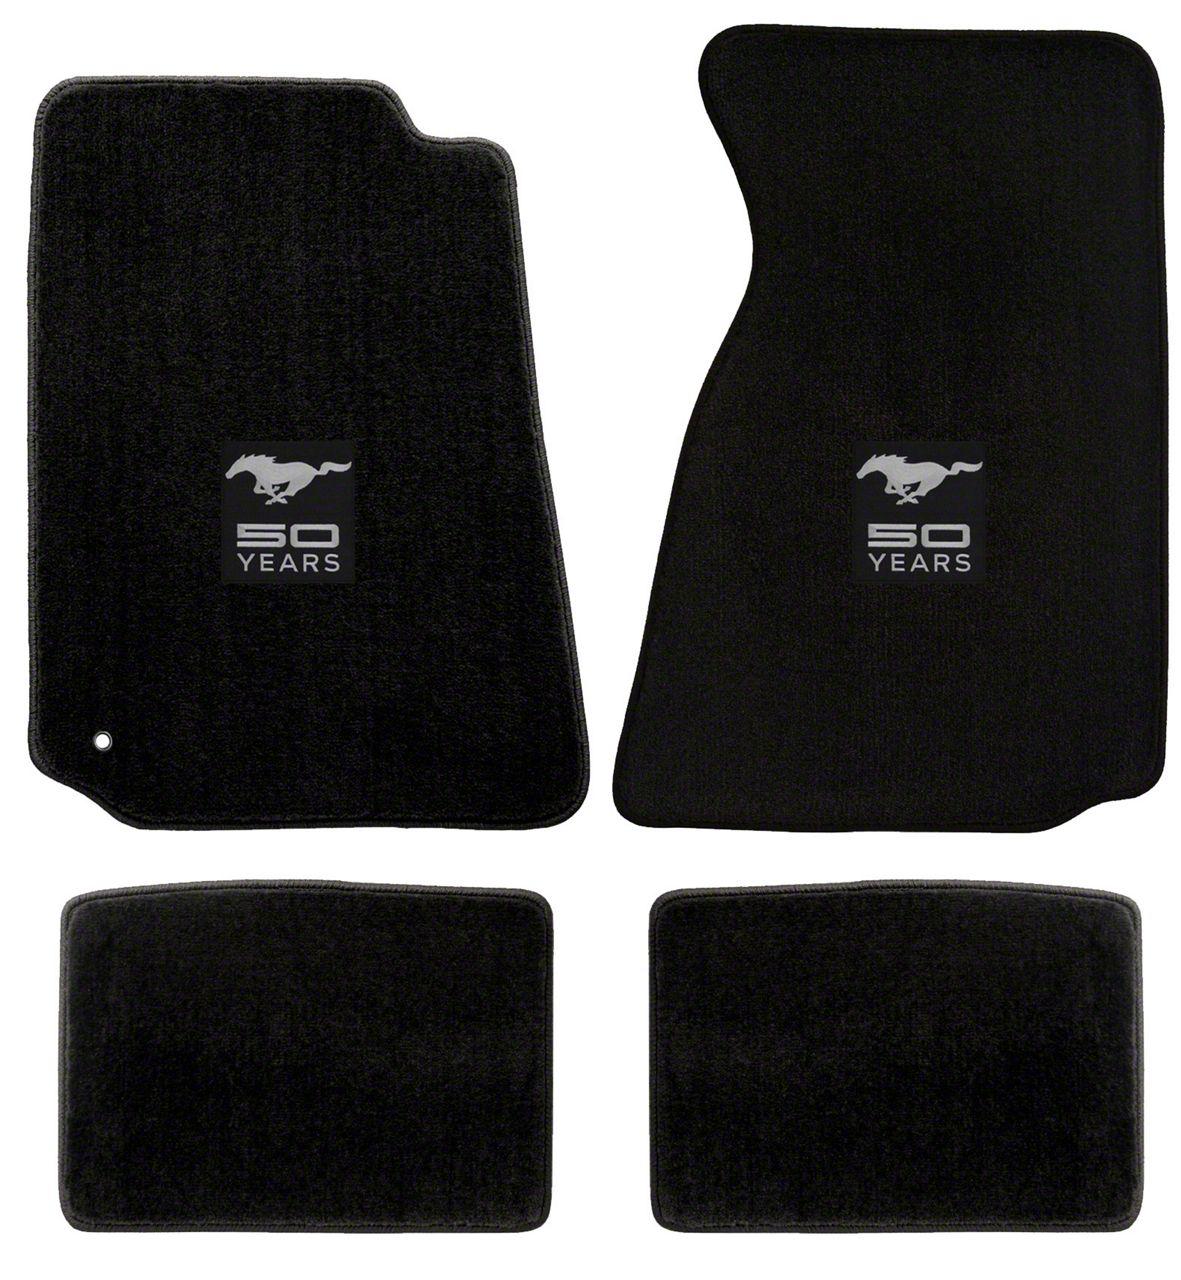 Lloyd Front & Rear Floor Mats w/ 50th Anniversary Logo - Black (99-04 All)